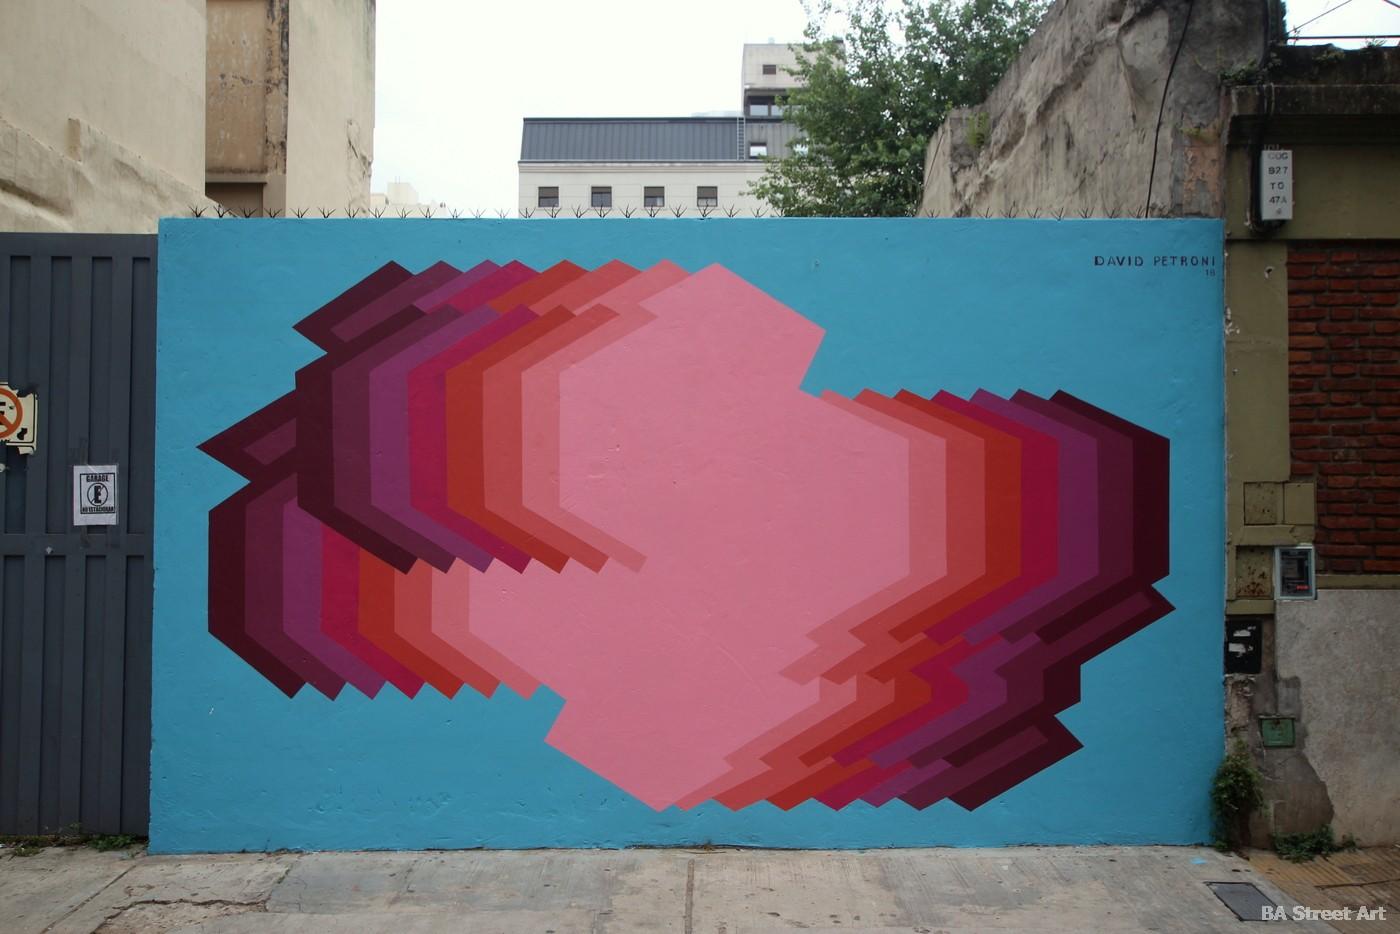 arte abstracto argentina buenos aires street art david petroni